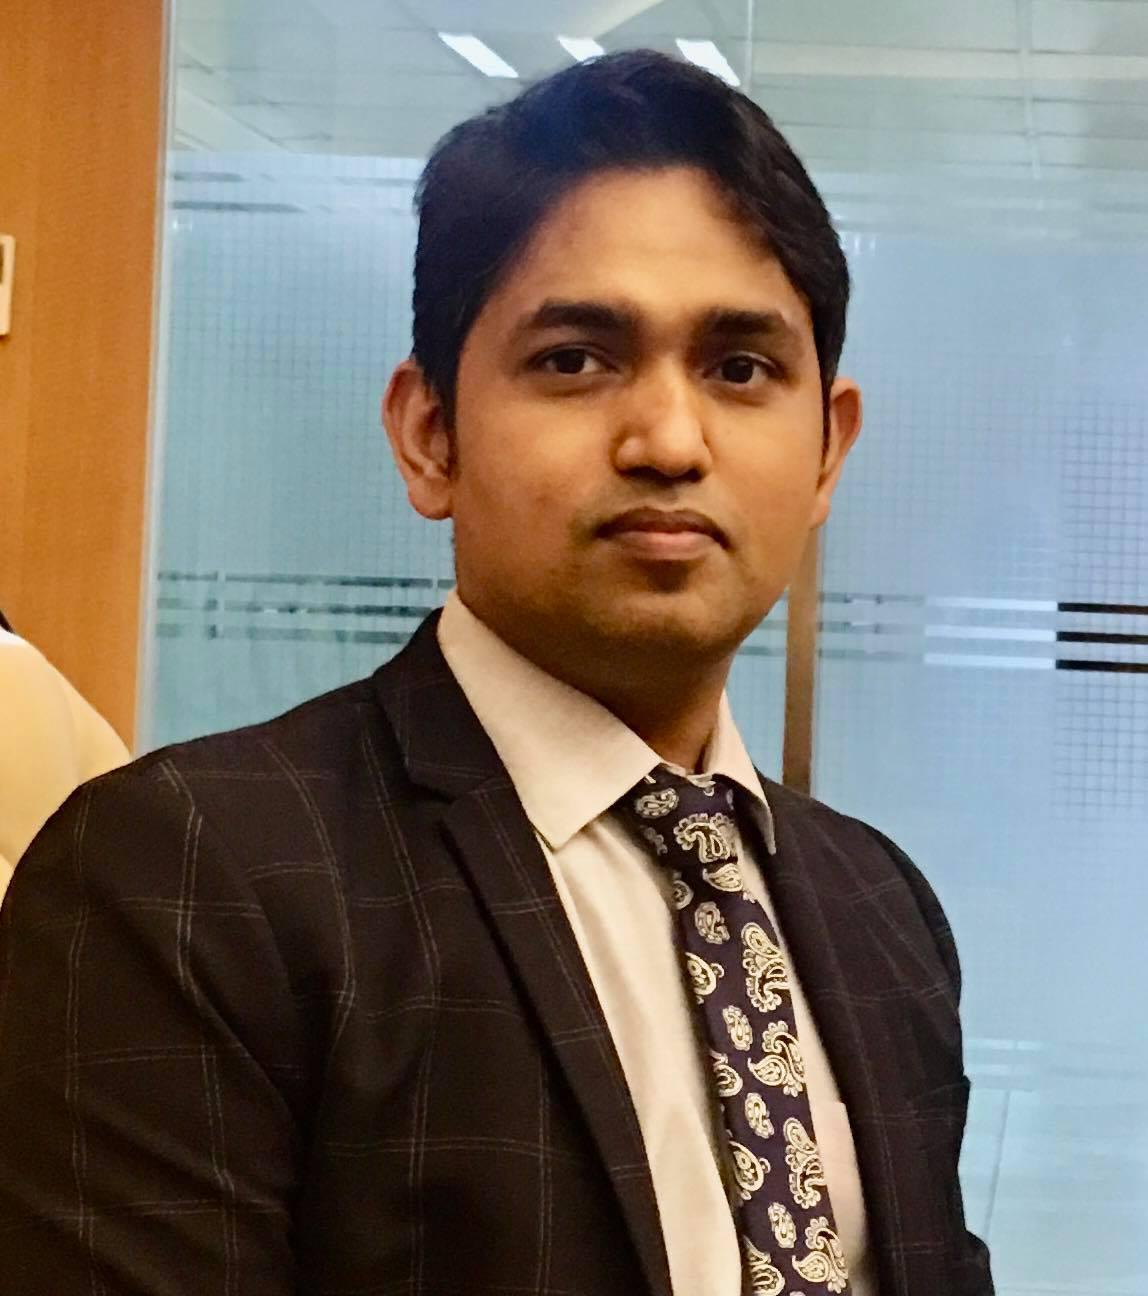 Dr. Md. Abdul Awal Khan